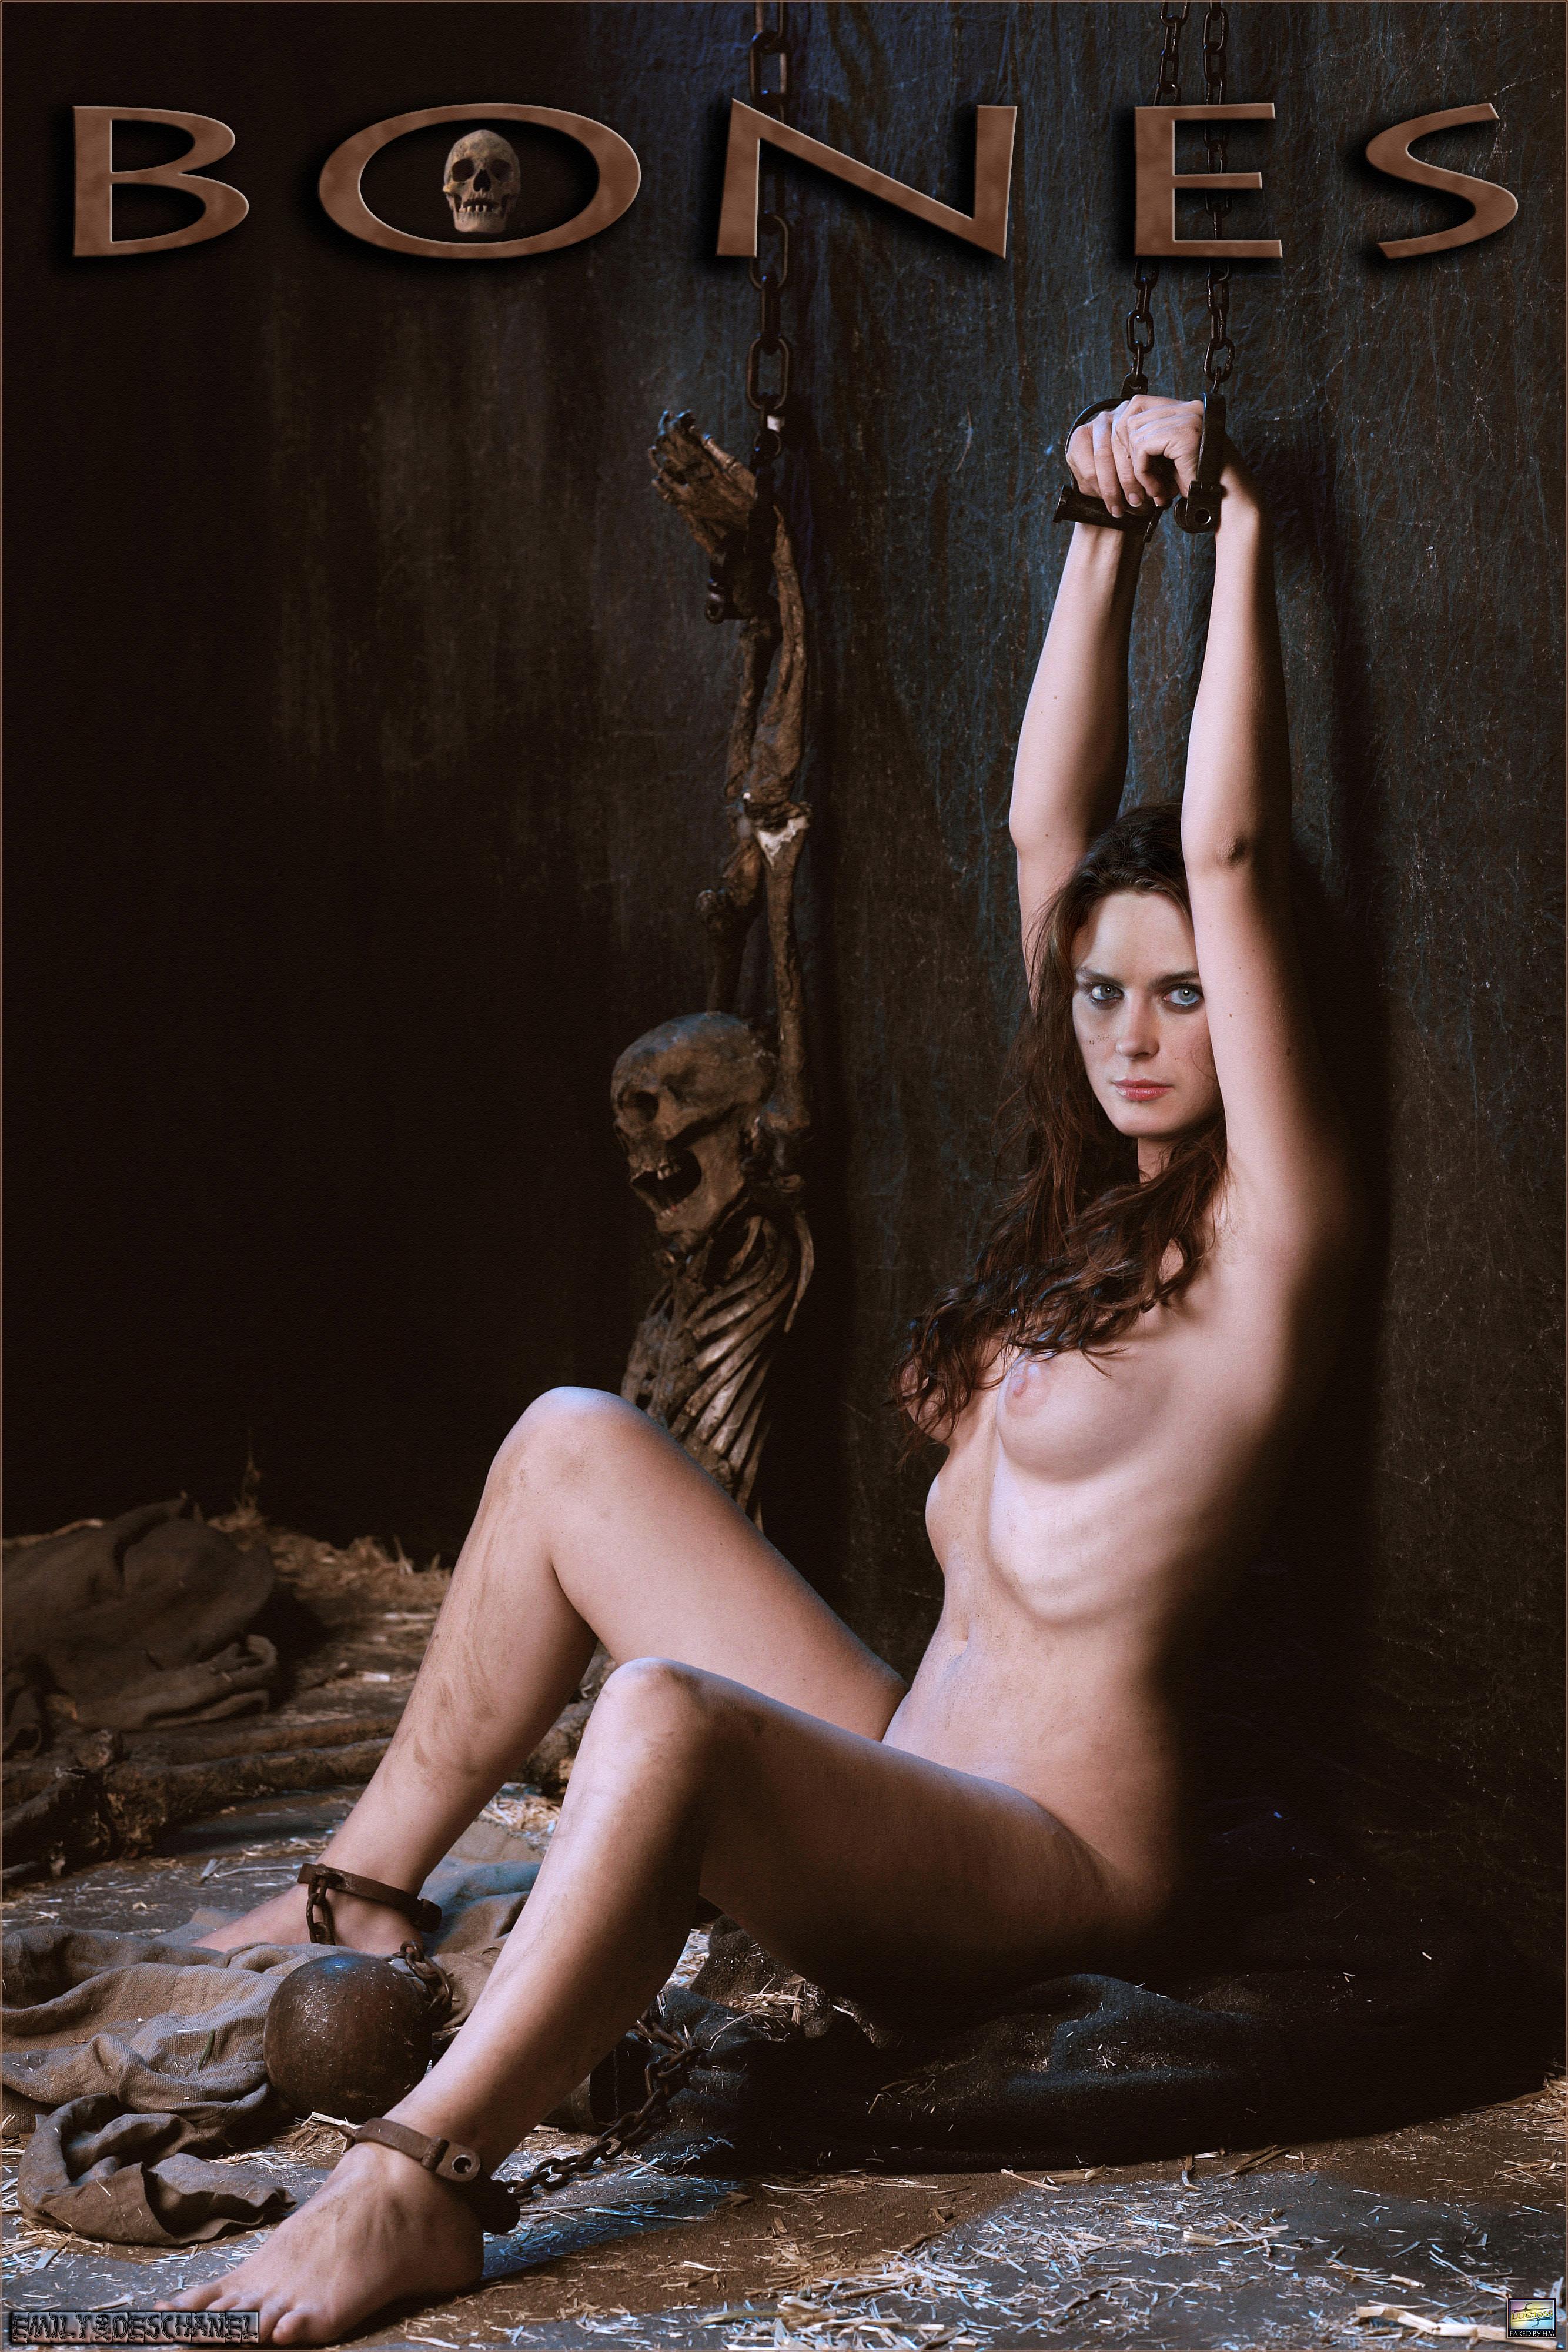 zoey deschanel nude